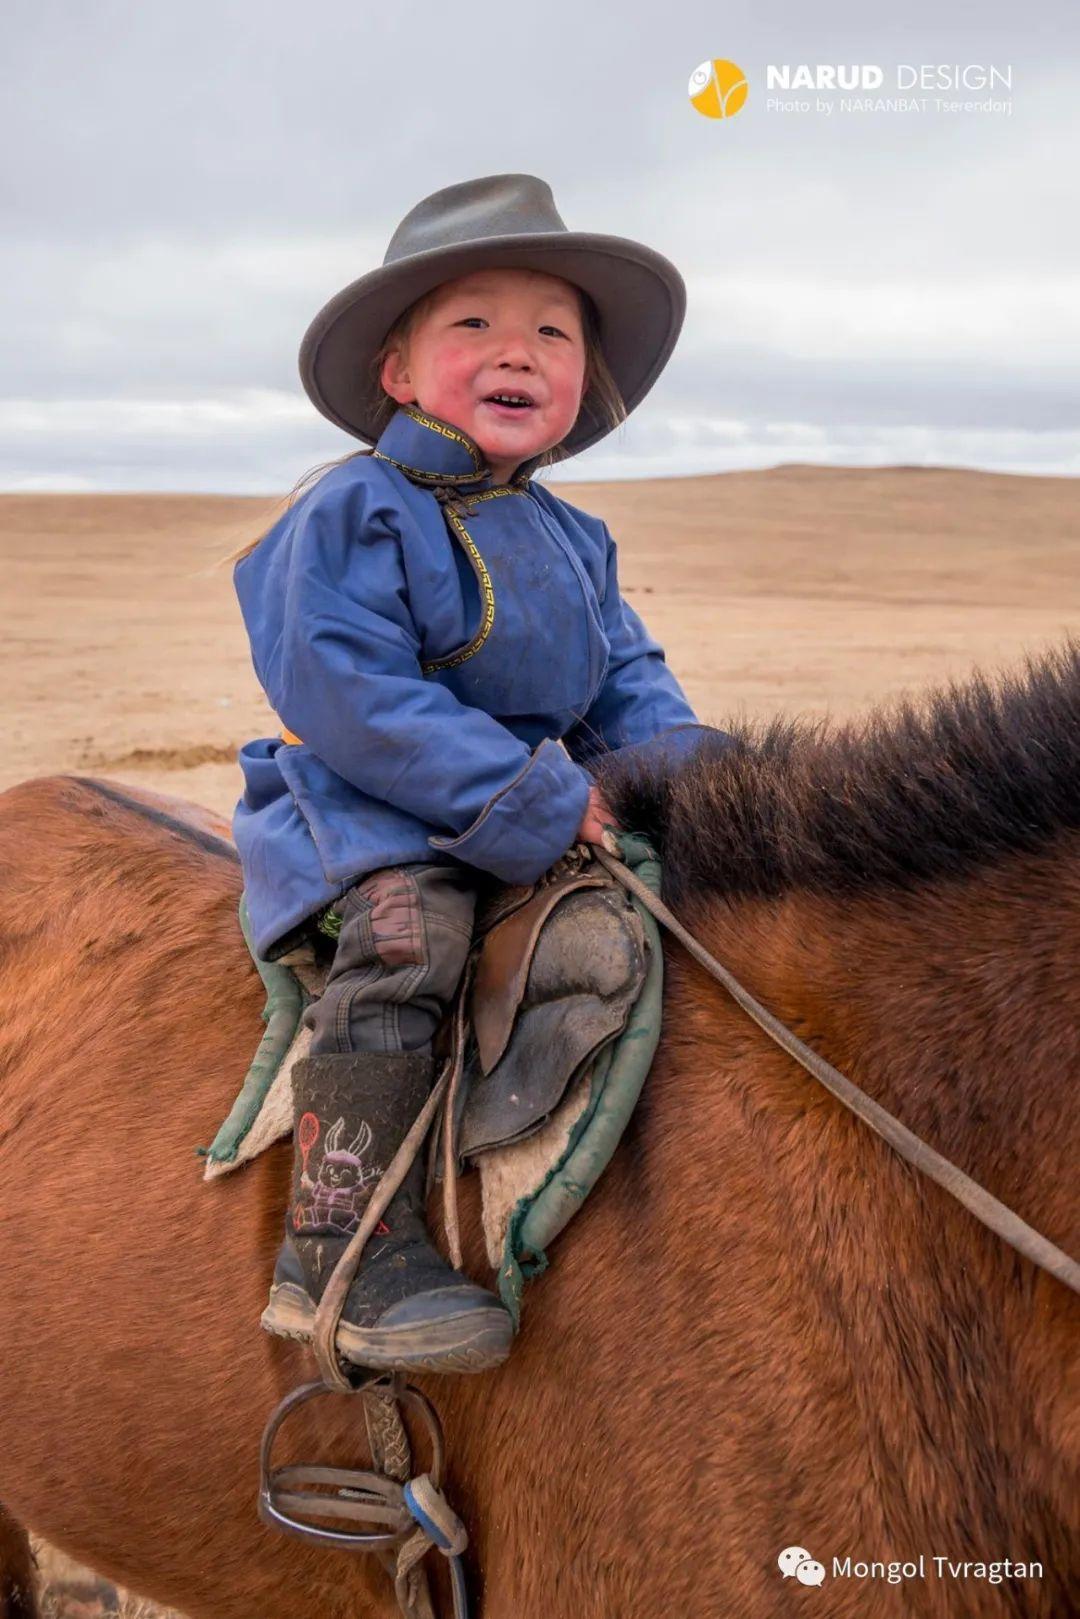 ᠮᠣᠩᠭᠤᠯ ᠰᠡᠭᠦᠳᠡᠷ- ᠴ᠂ ᠨᠠᠷᠠᠨᠪᠠᠲᠤ 第11张 ᠮᠣᠩᠭᠤᠯ ᠰᠡᠭᠦᠳᠡᠷ- ᠴ᠂ ᠨᠠᠷᠠᠨᠪᠠᠲᠤ 蒙古文化